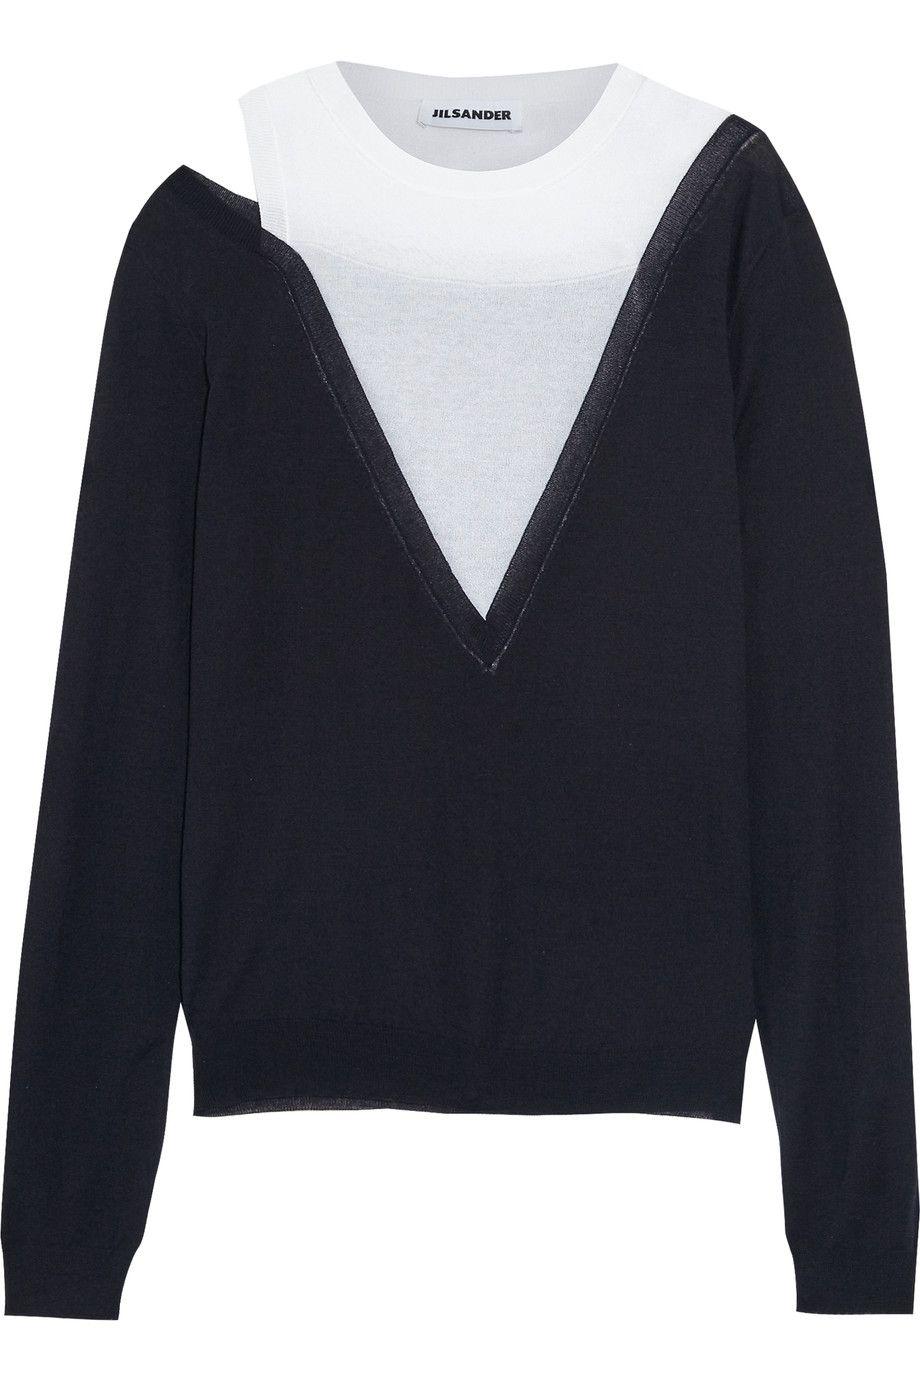 JIL SANDER Two-Tone Wool, Cotton And Silk Sweater. #jilsander ...